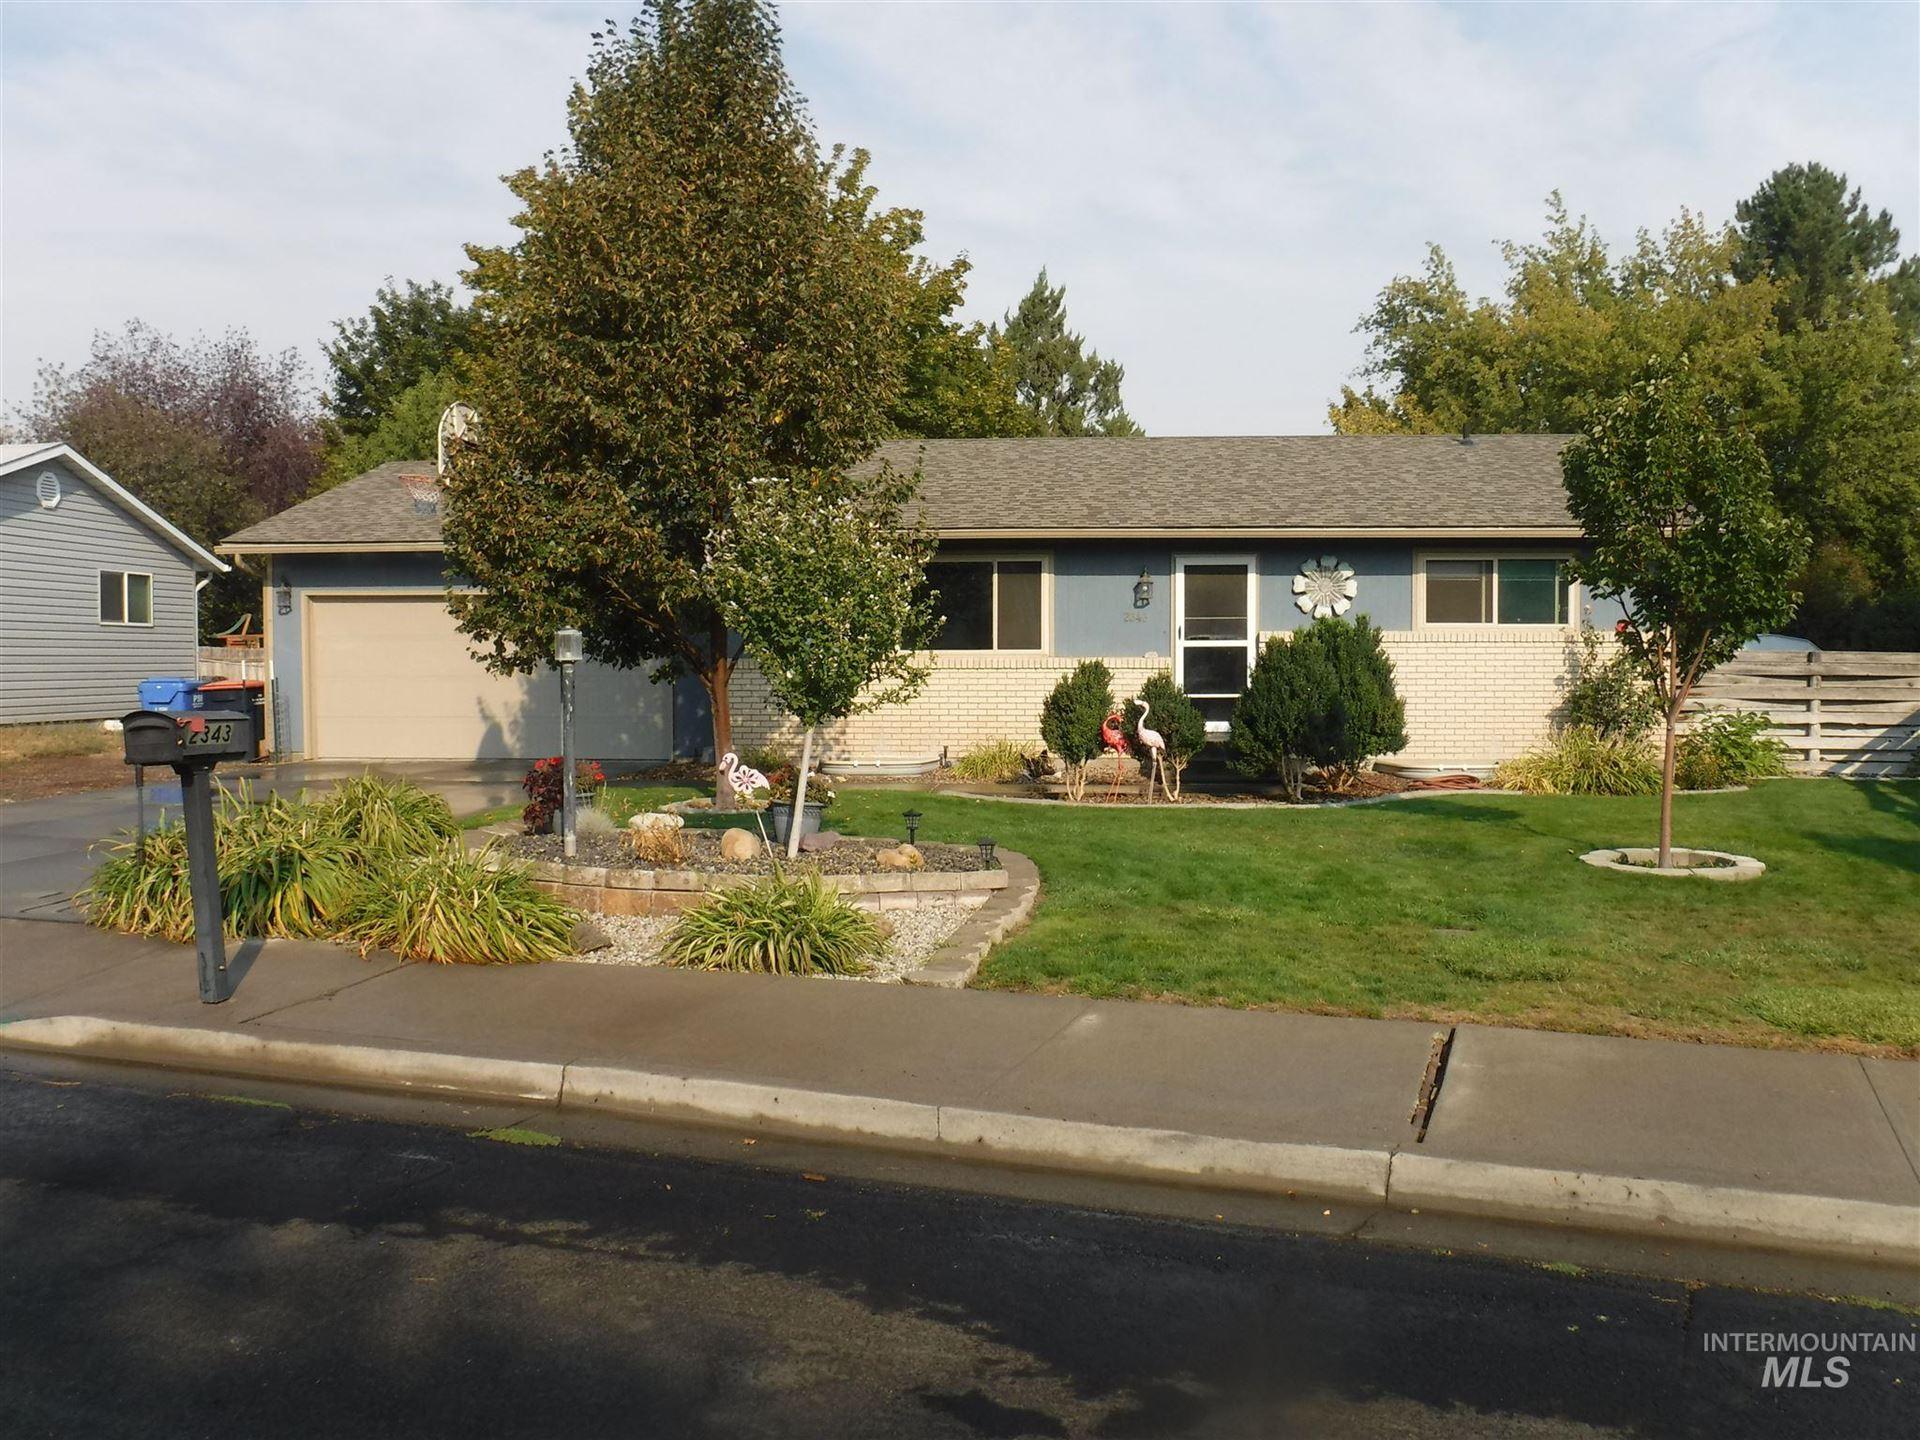 2343 Castle Dr., Twin Falls, ID 83301 - MLS#: 98781929